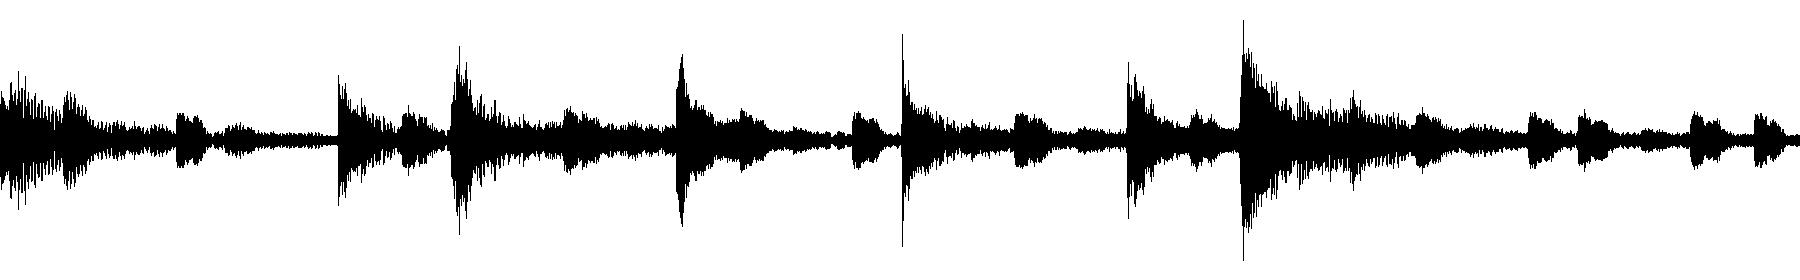 g abs05 077